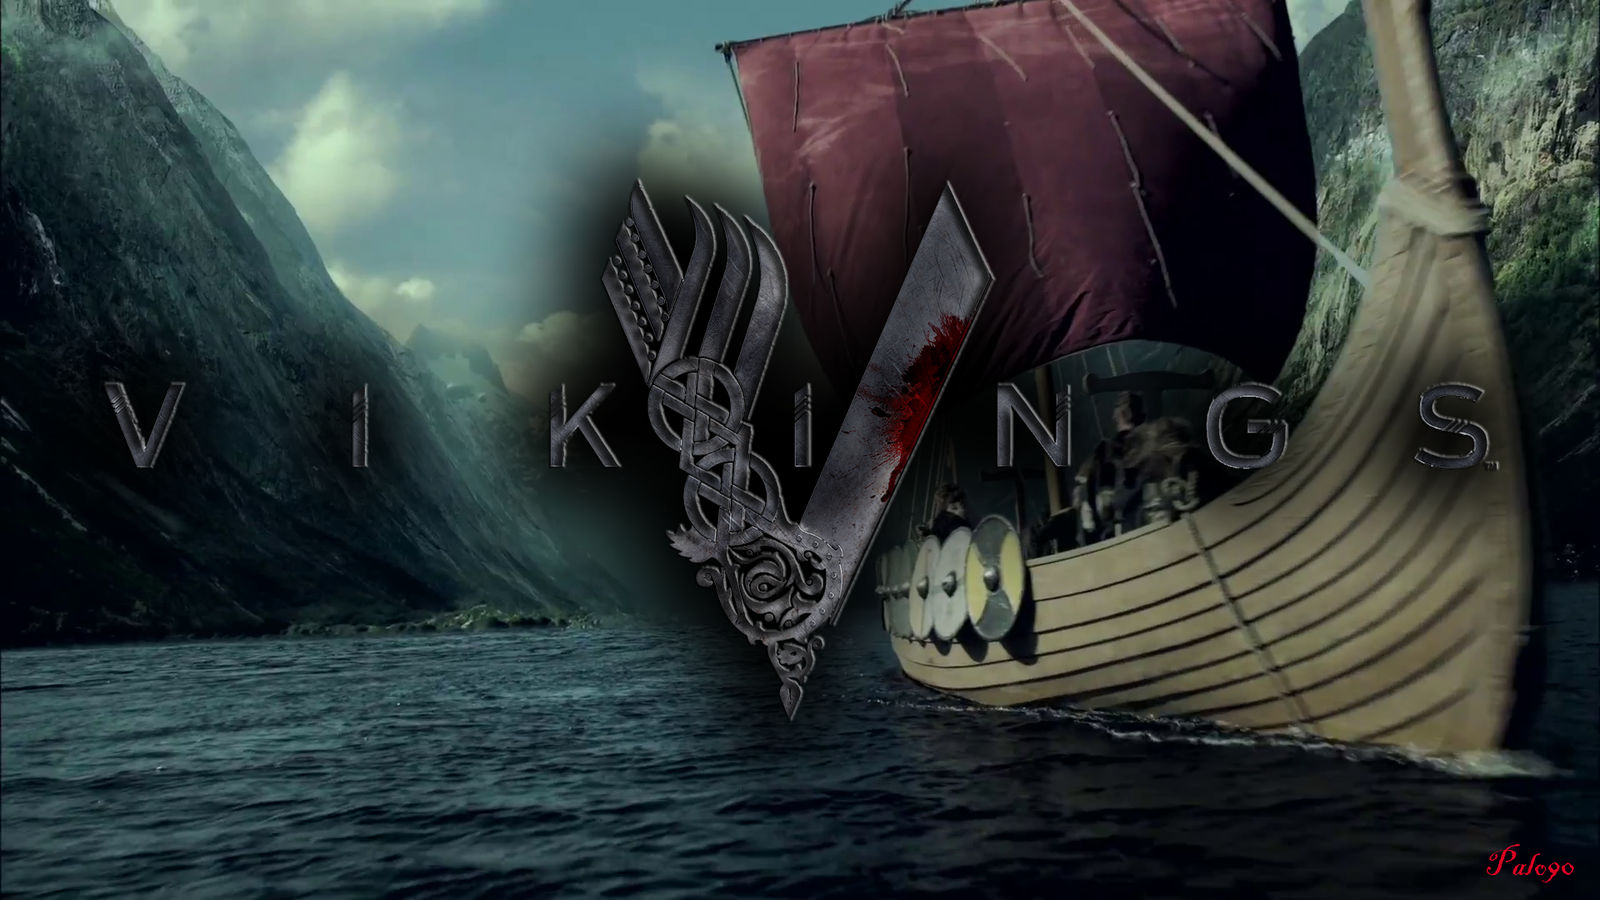 Vikings History Channel Wallpaper By Palo90 On 1600x900